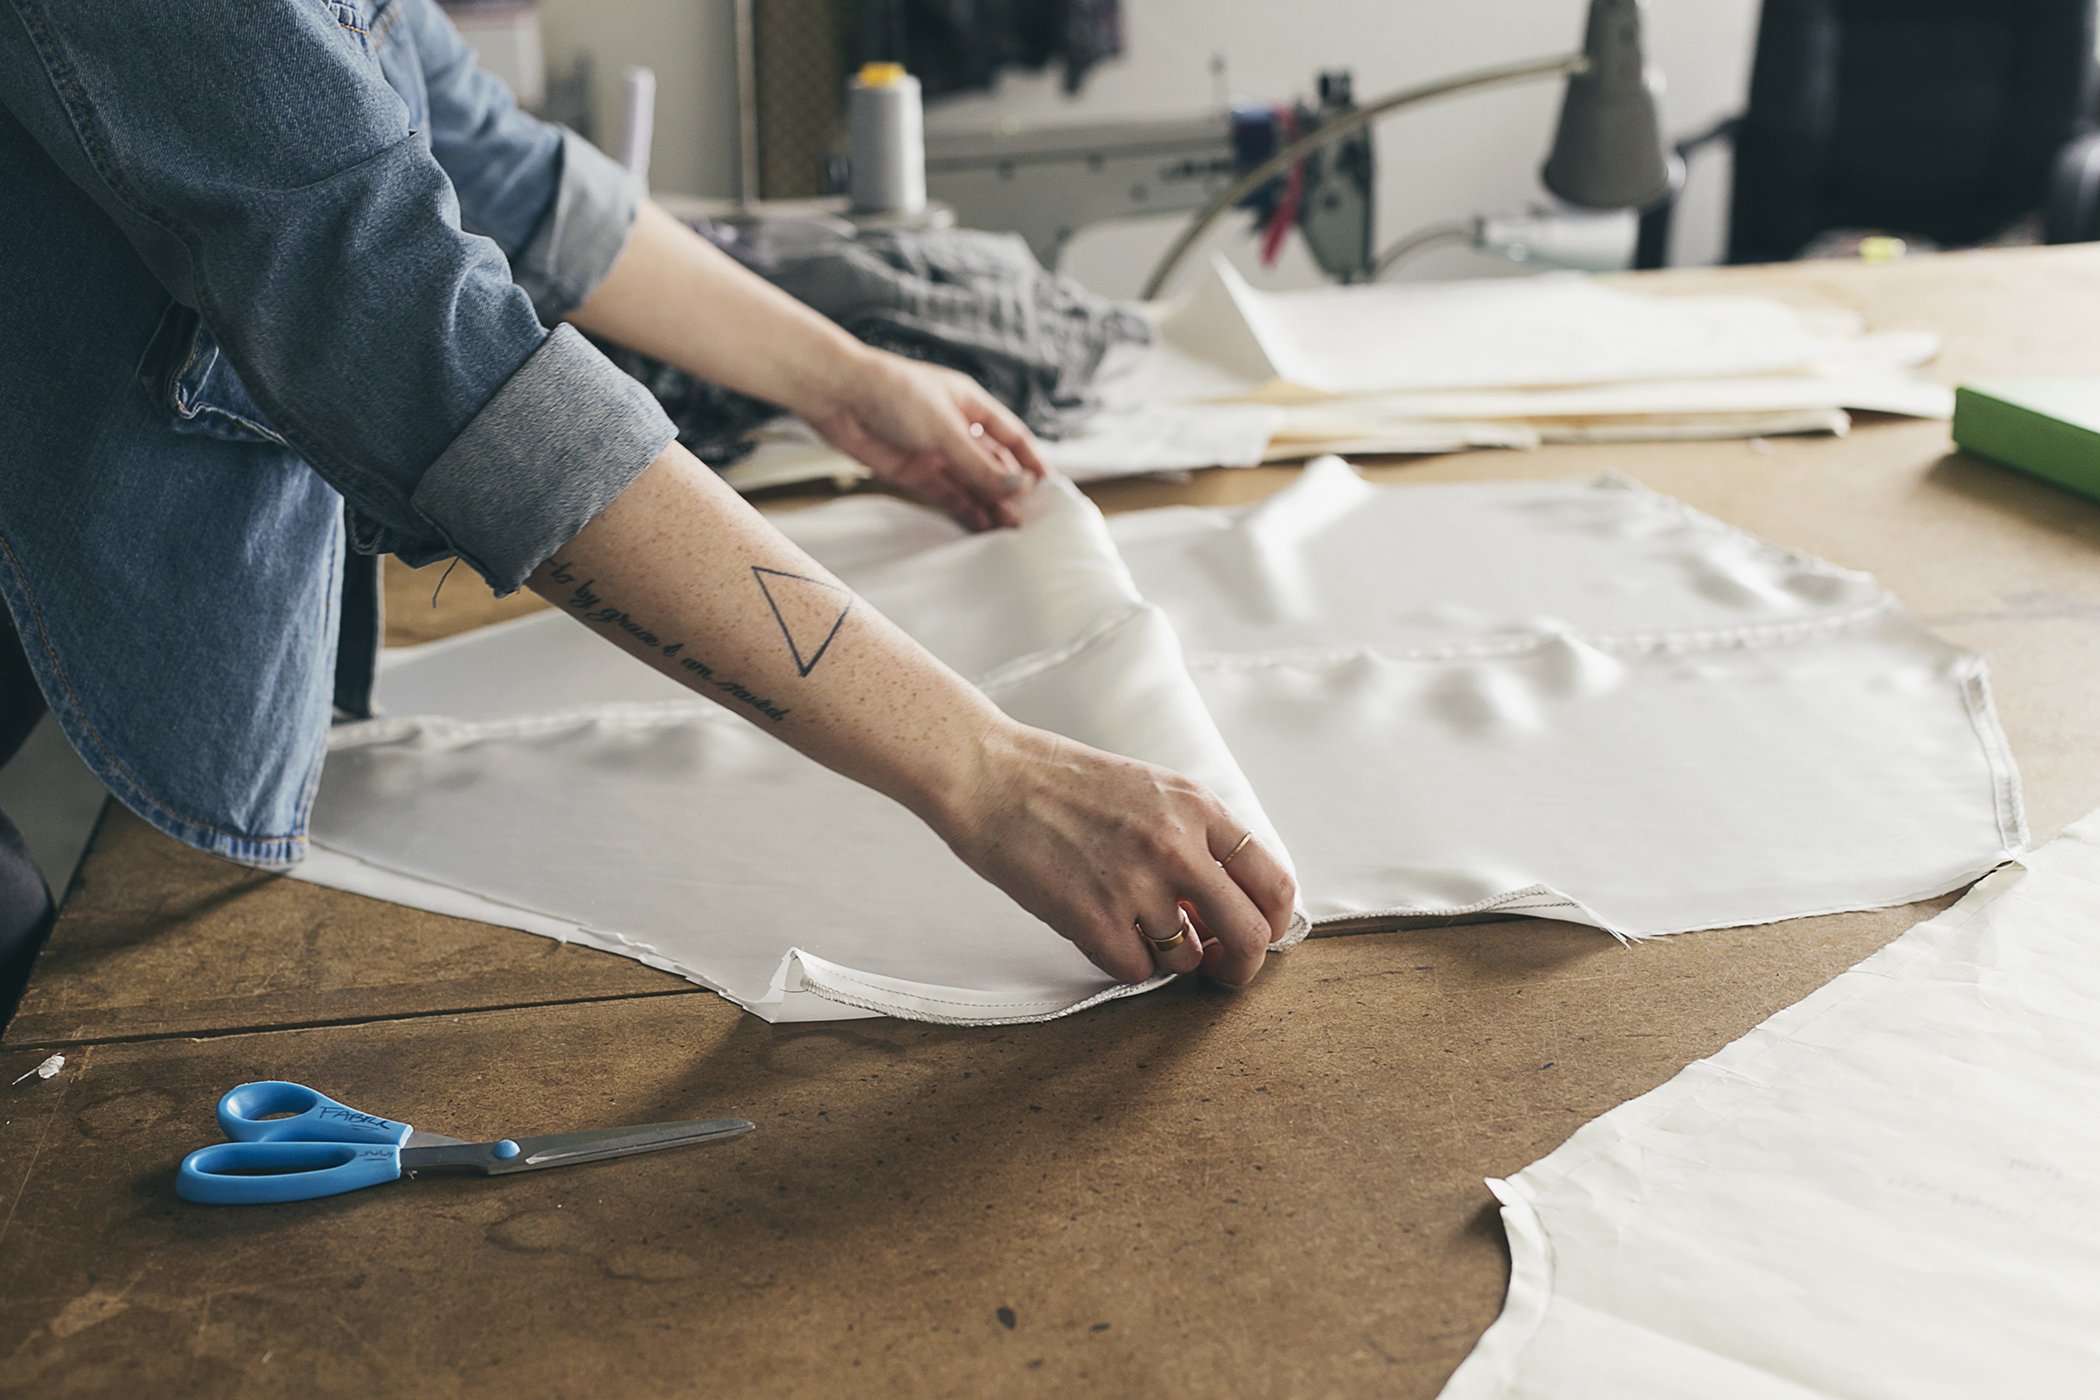 Woman sewing patterns